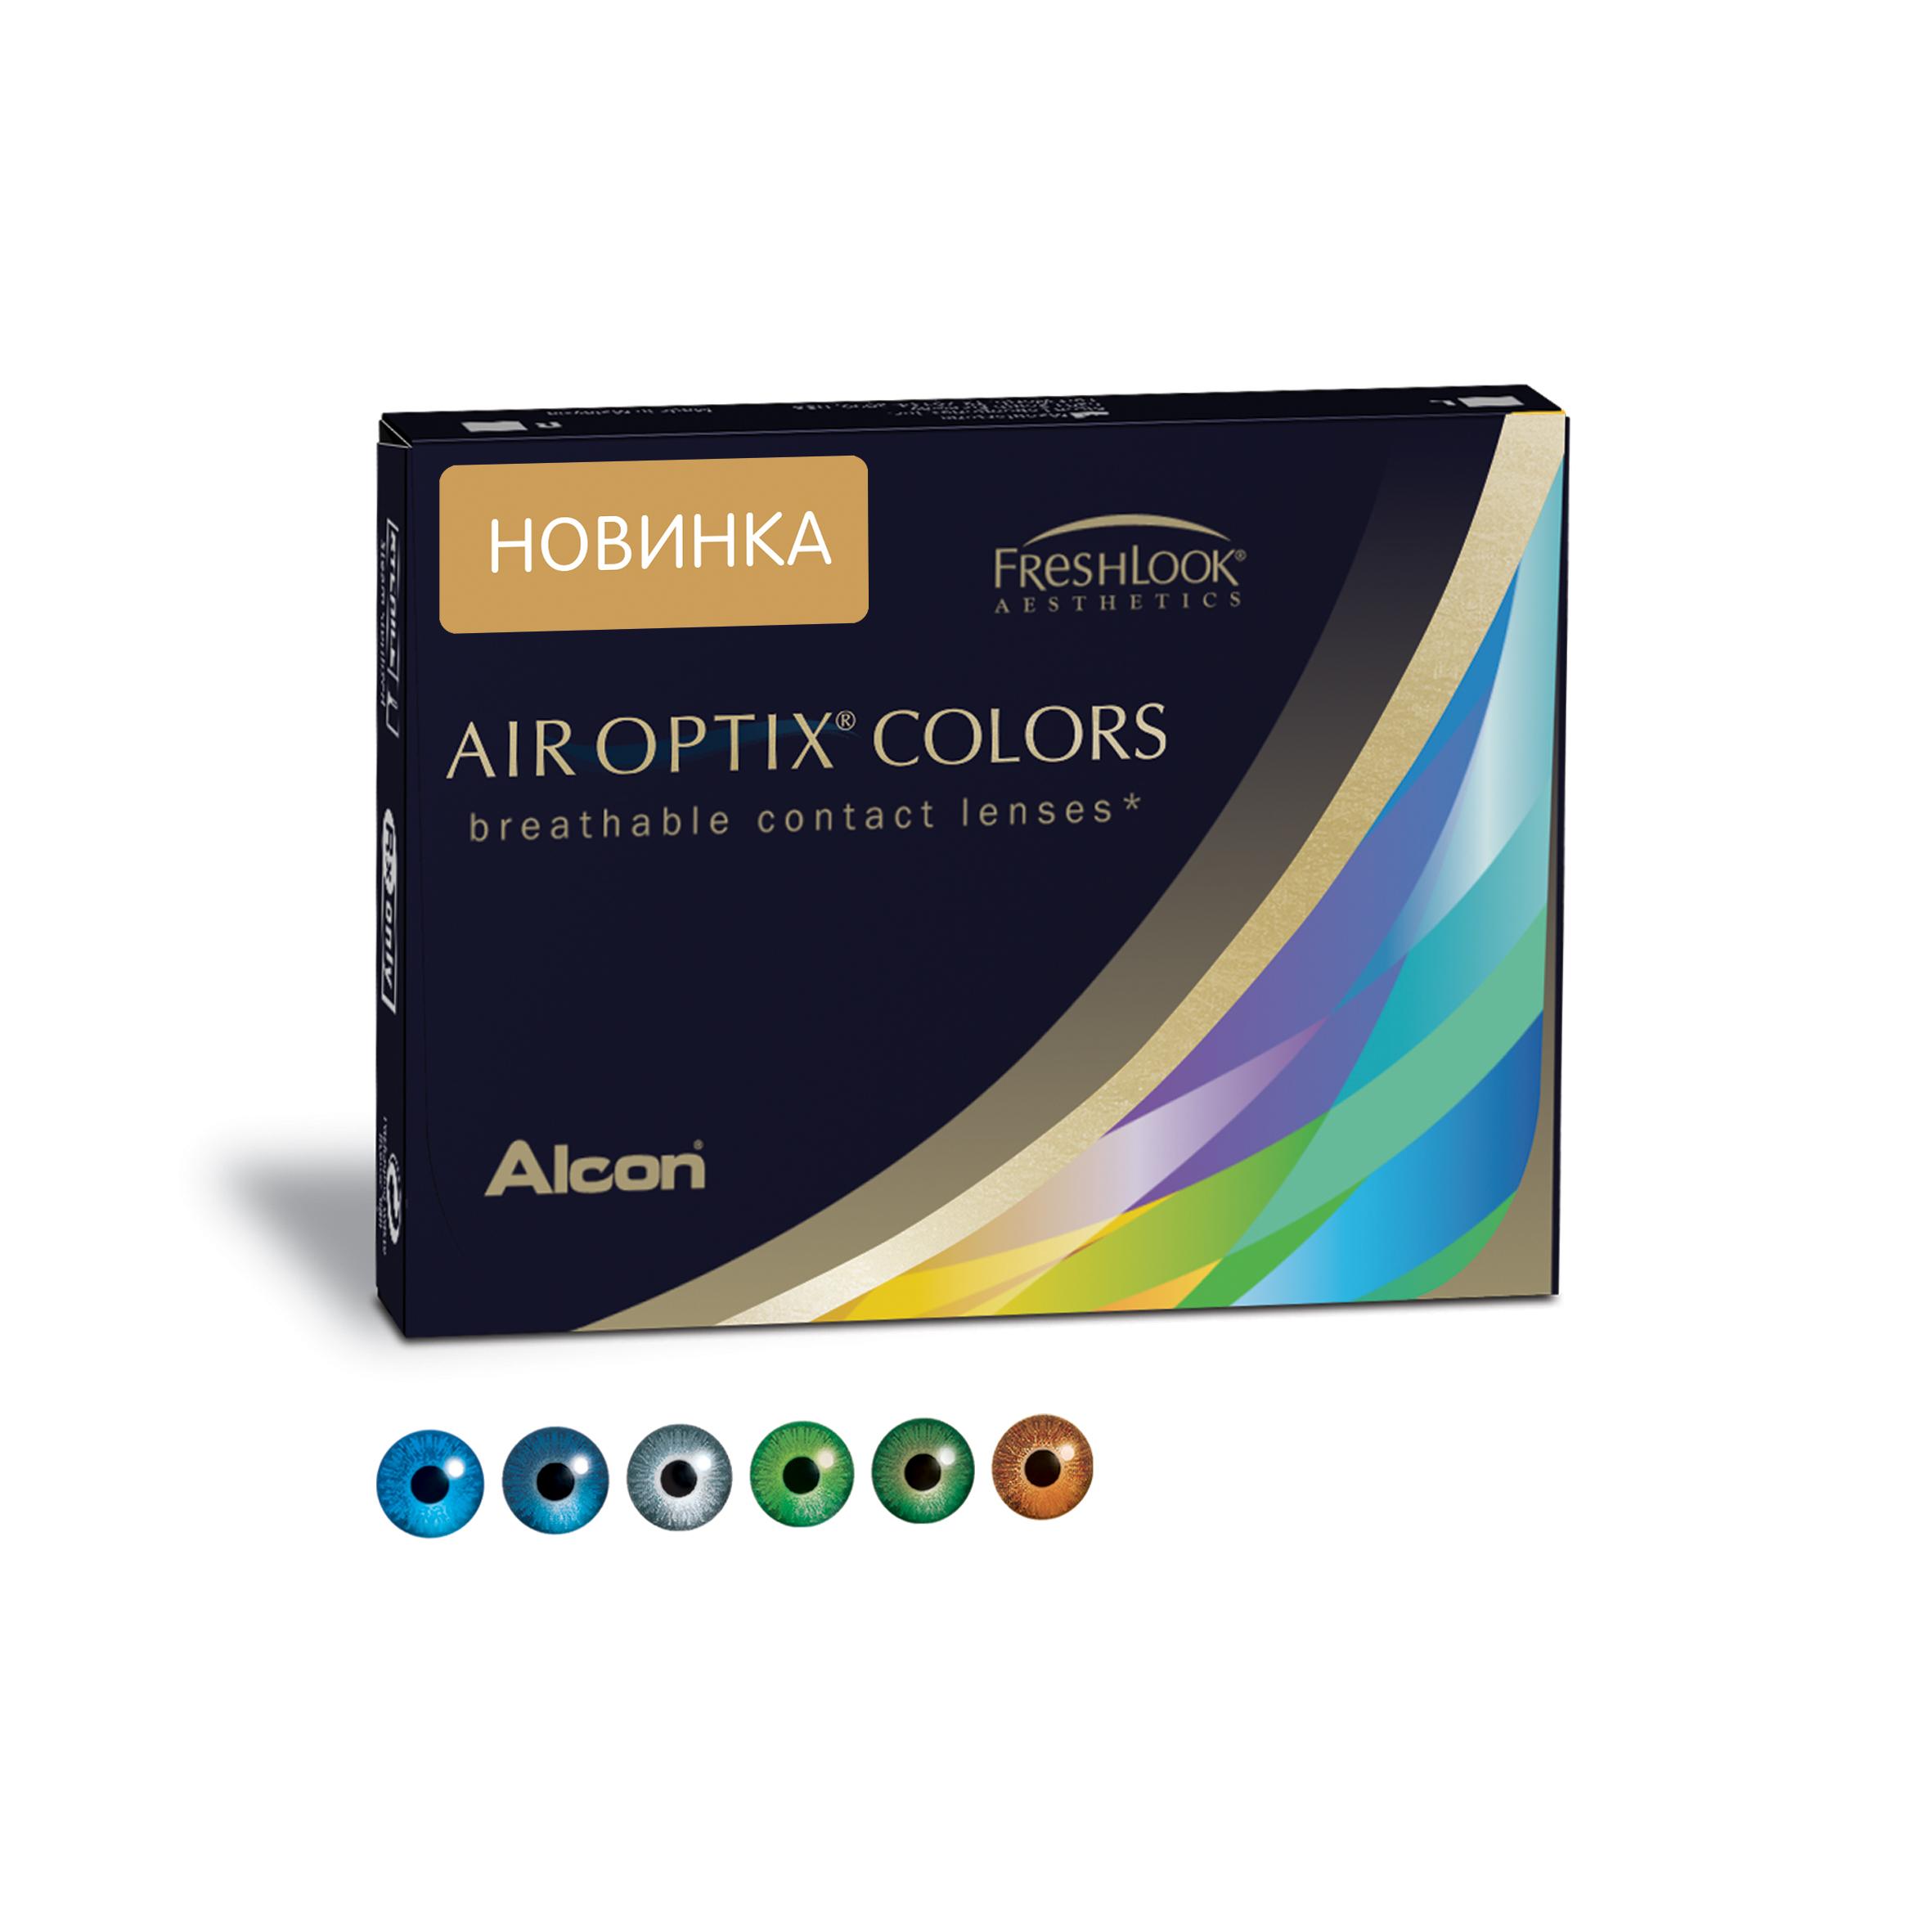 Аlcon контактные линзы Air Optix Colors 2 шт -0.25 Gemstone Green31746097Мягкие контактные линзы